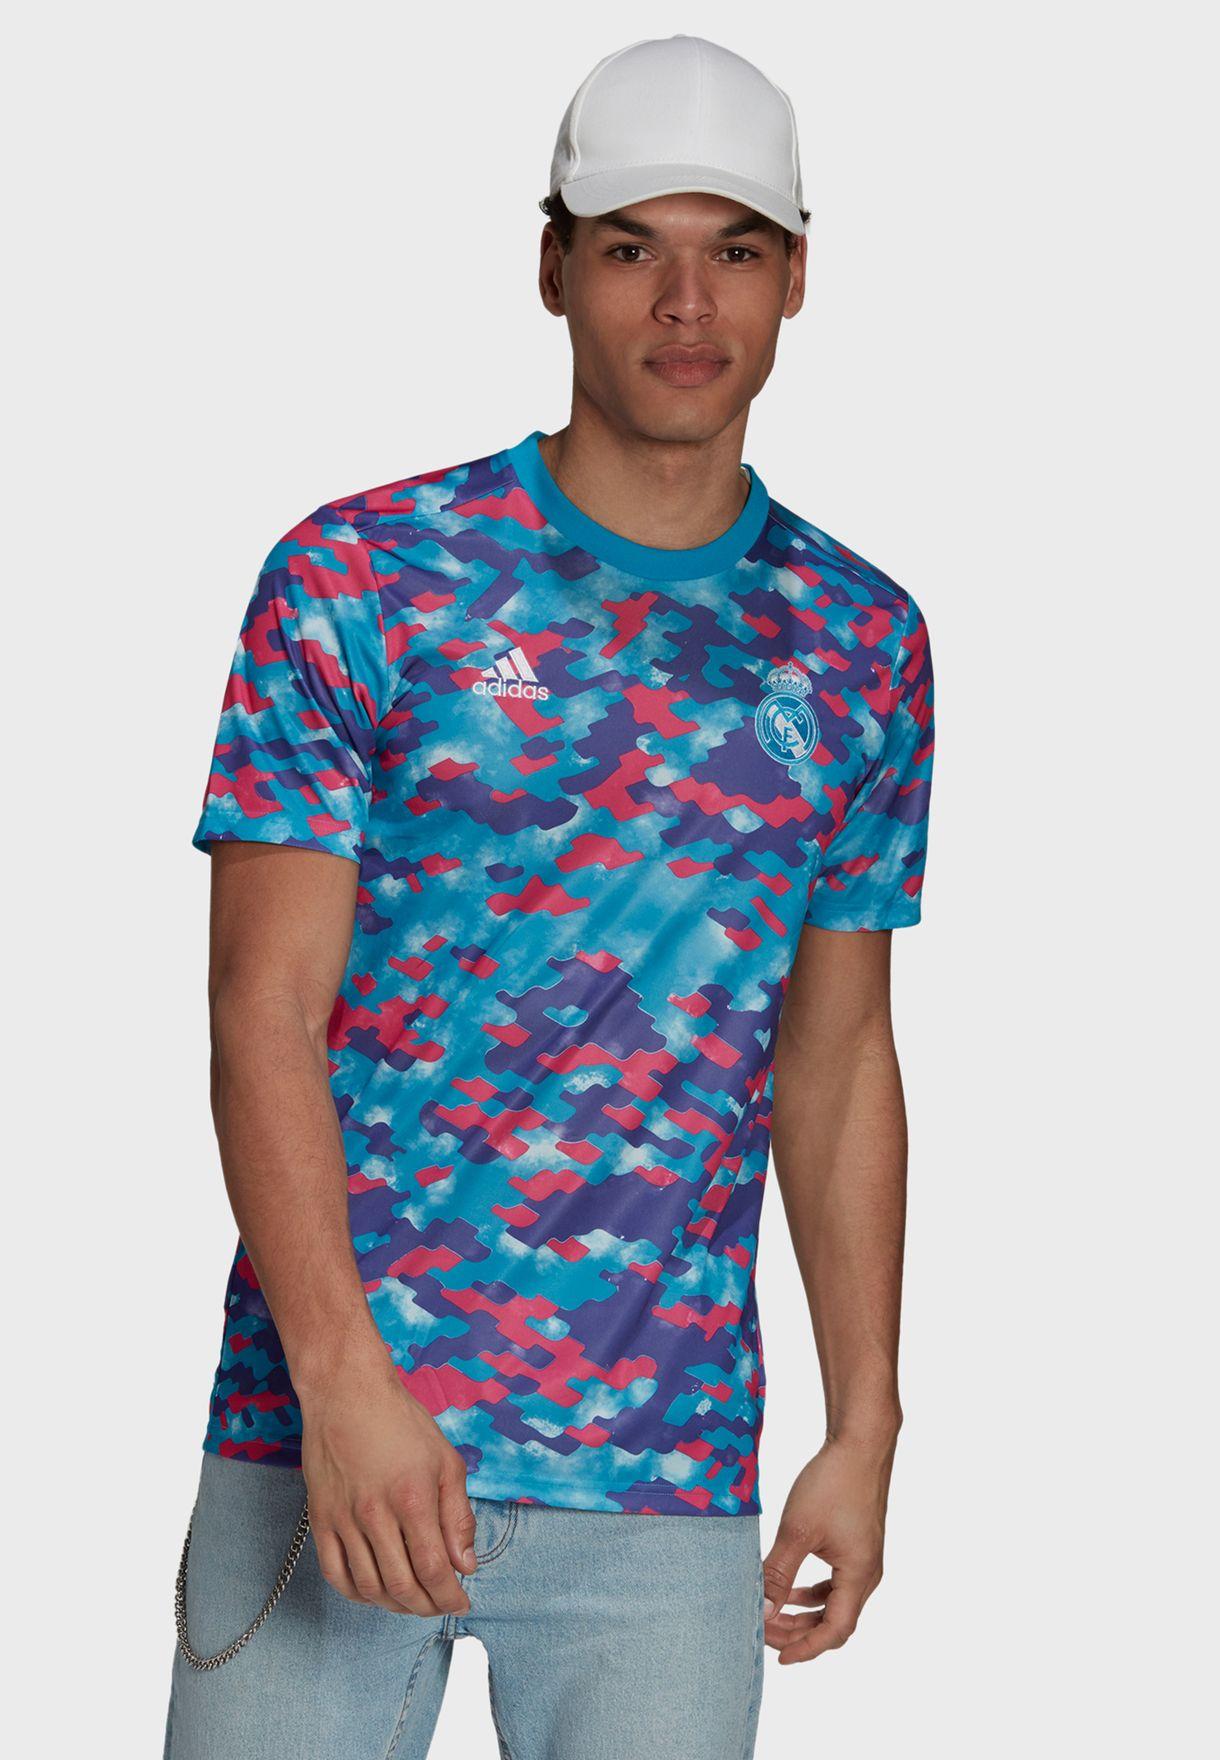 Real Madrid Preshi T-Shirt